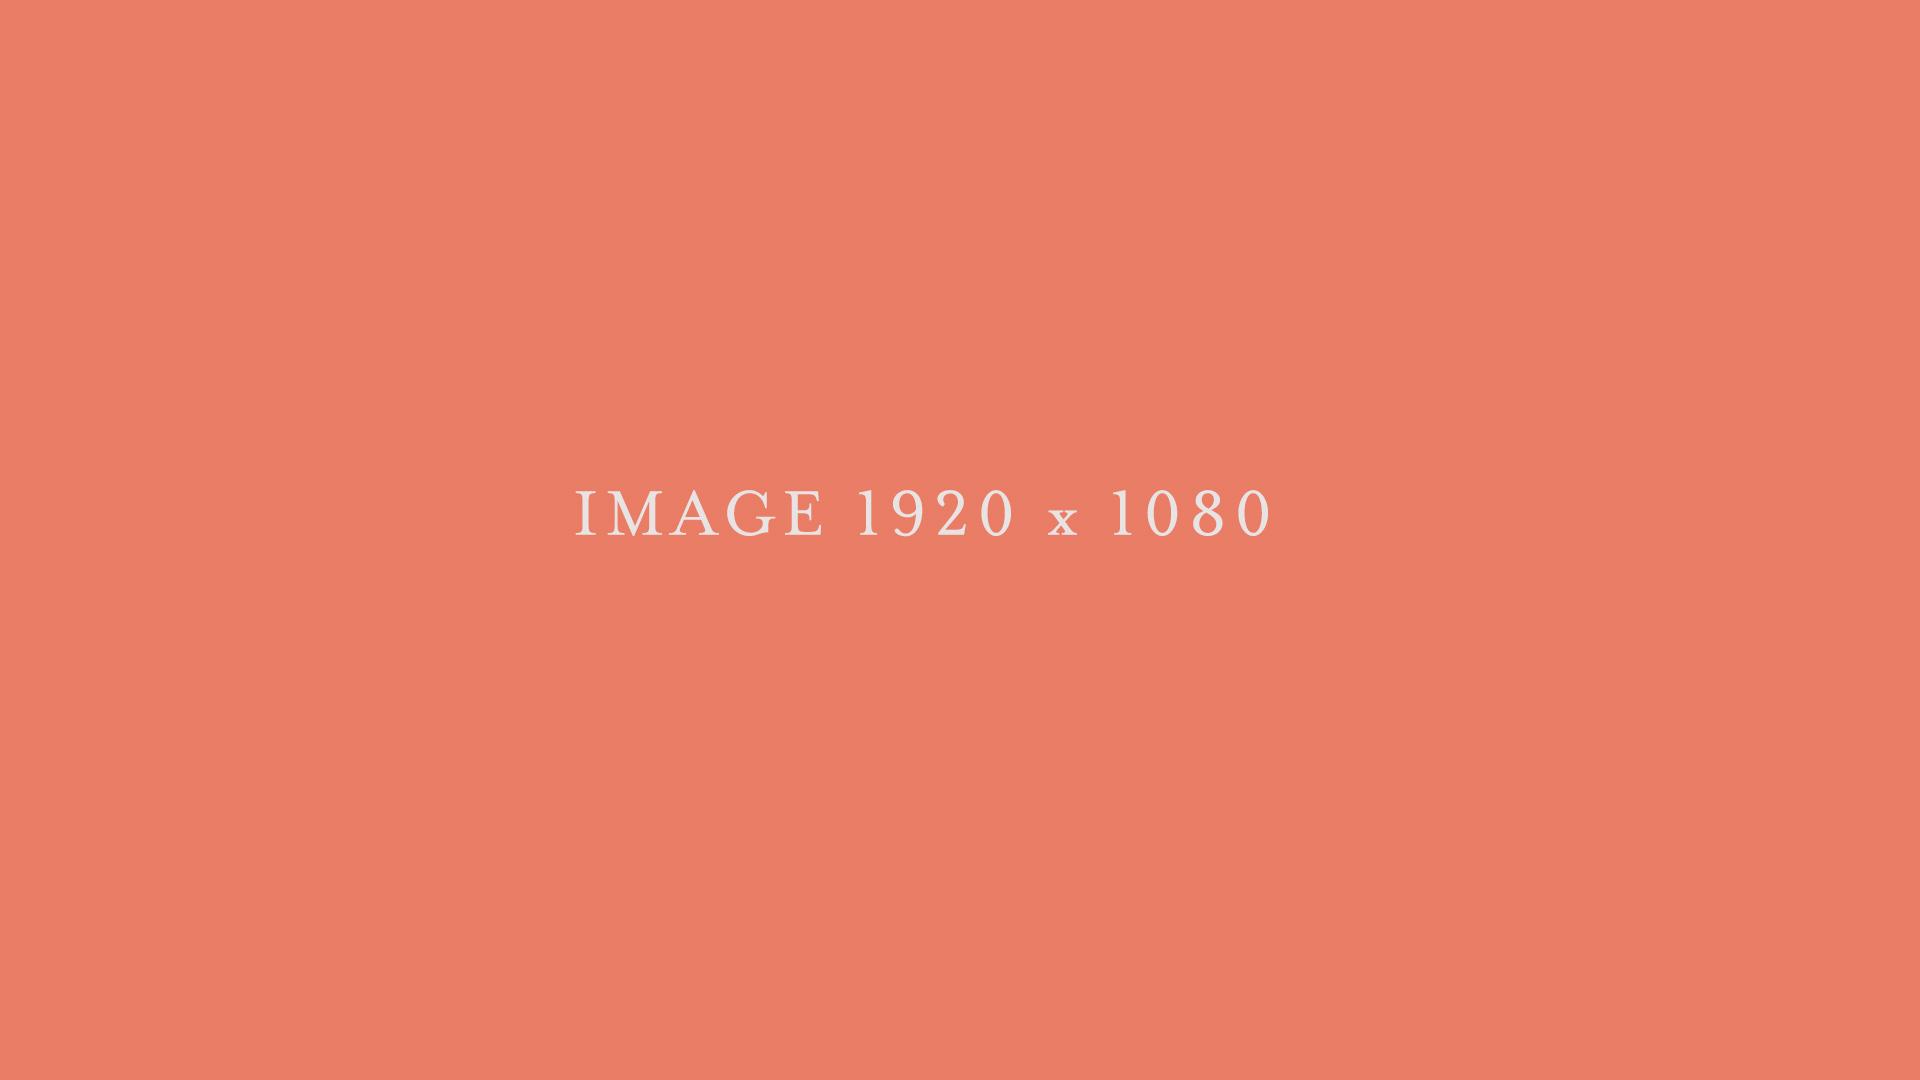 image_1920x1080.jpg